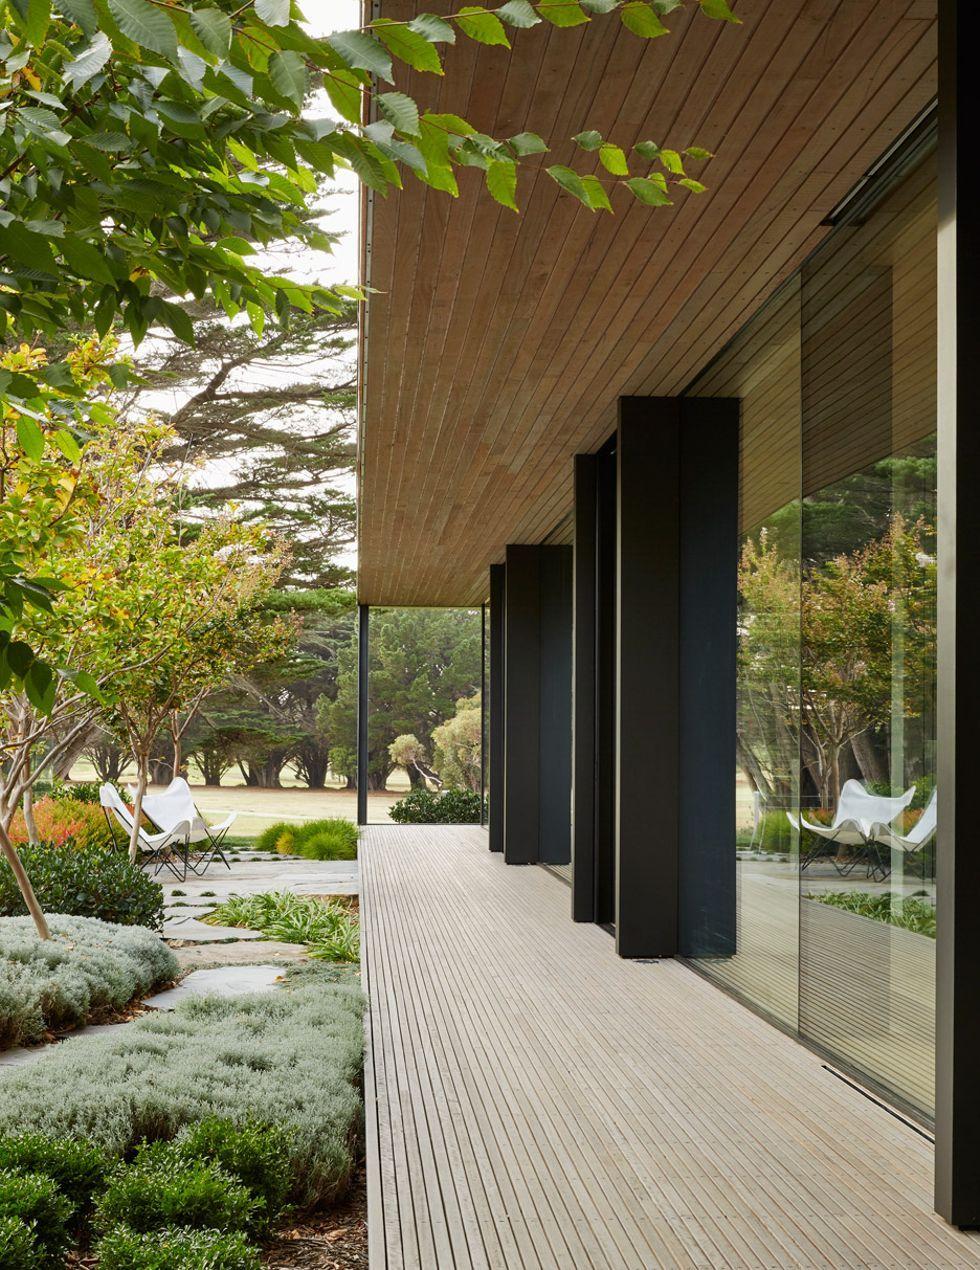 links-courtyard-house-inarc-architects-melbourne-australia_dezeen_936_17